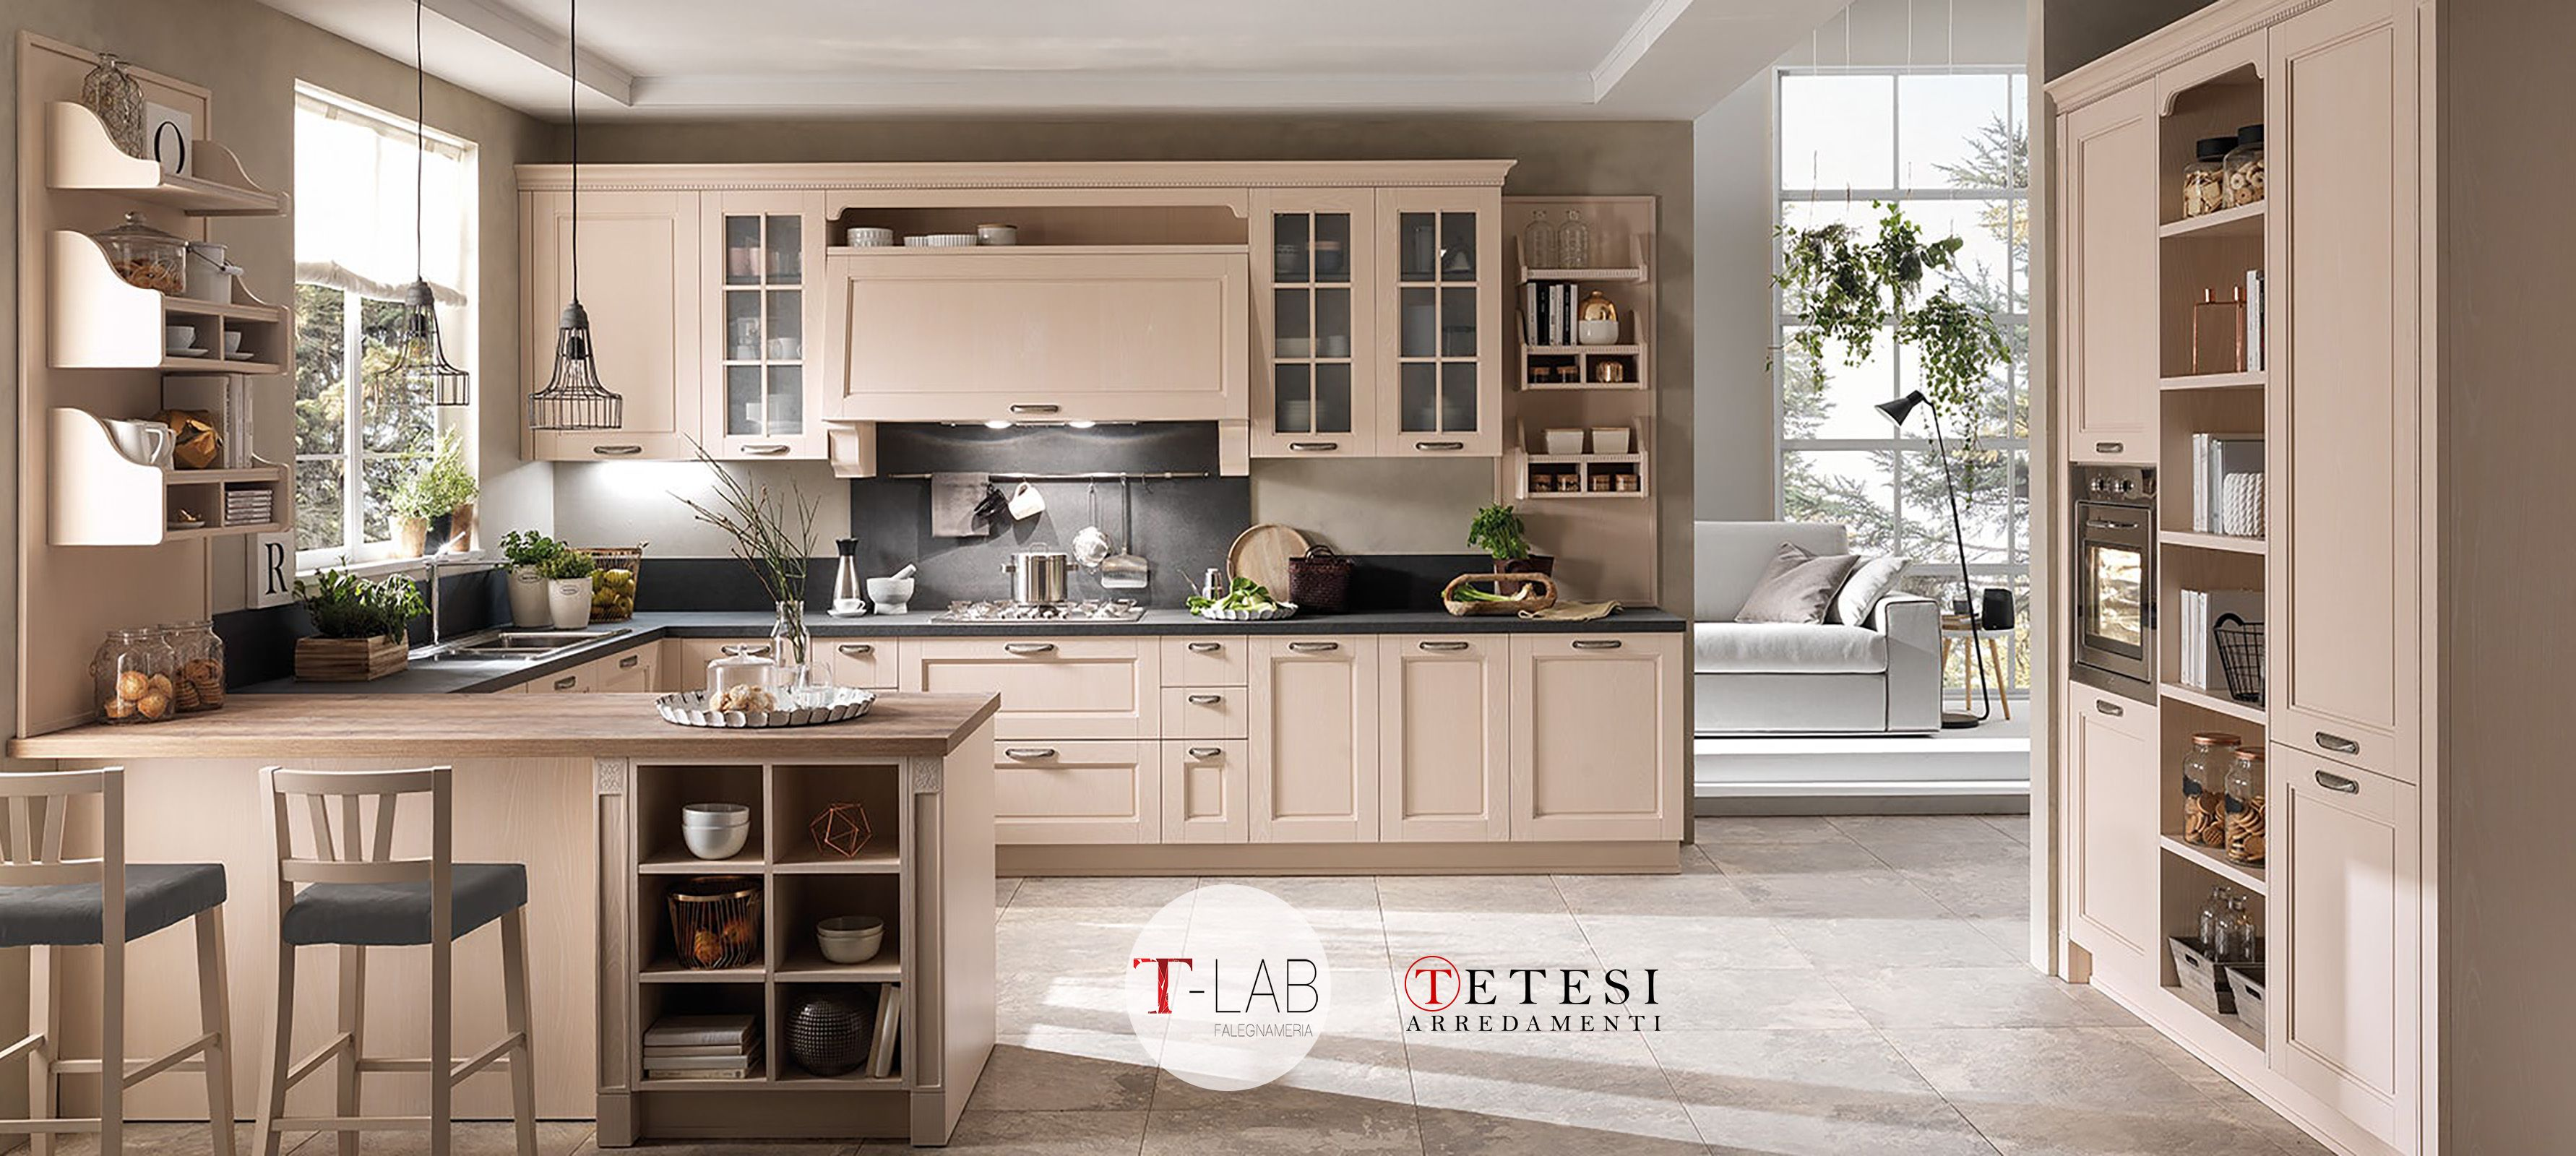 Tetesi Arredamenti Art Innovation Le cucine TLAB ...